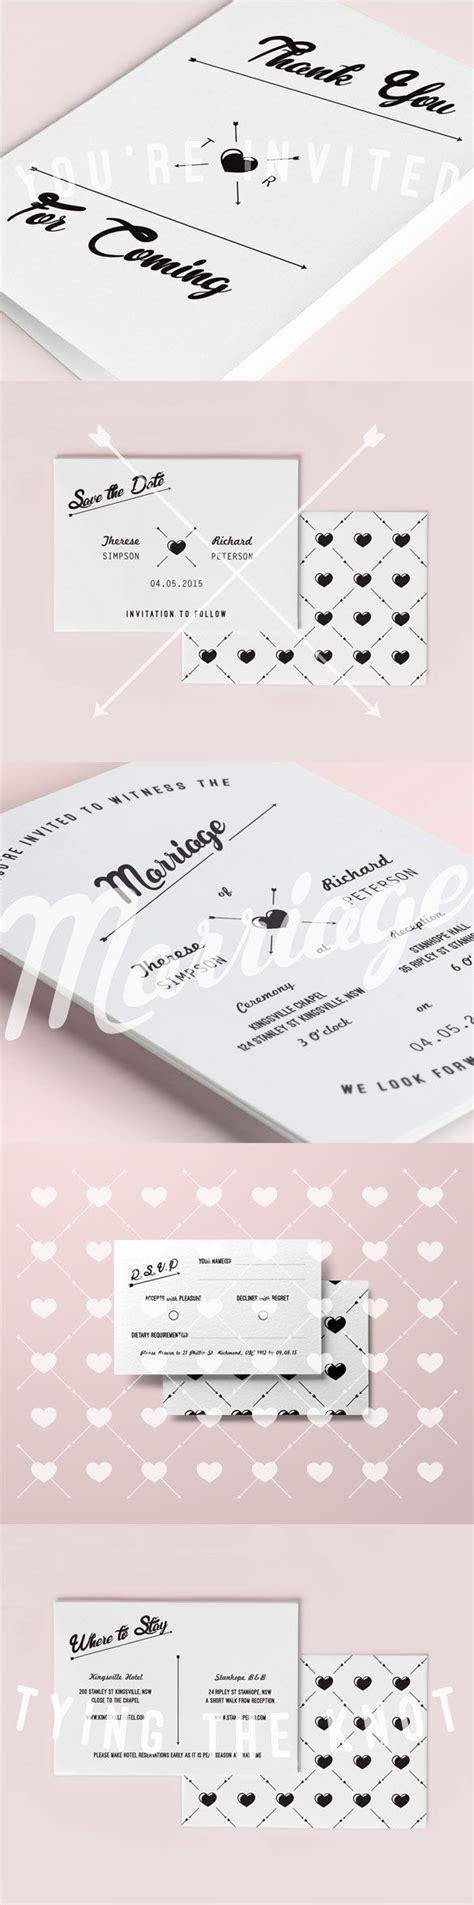 50 s theme wedding invitations 8 best vintage theme diy printable wedding